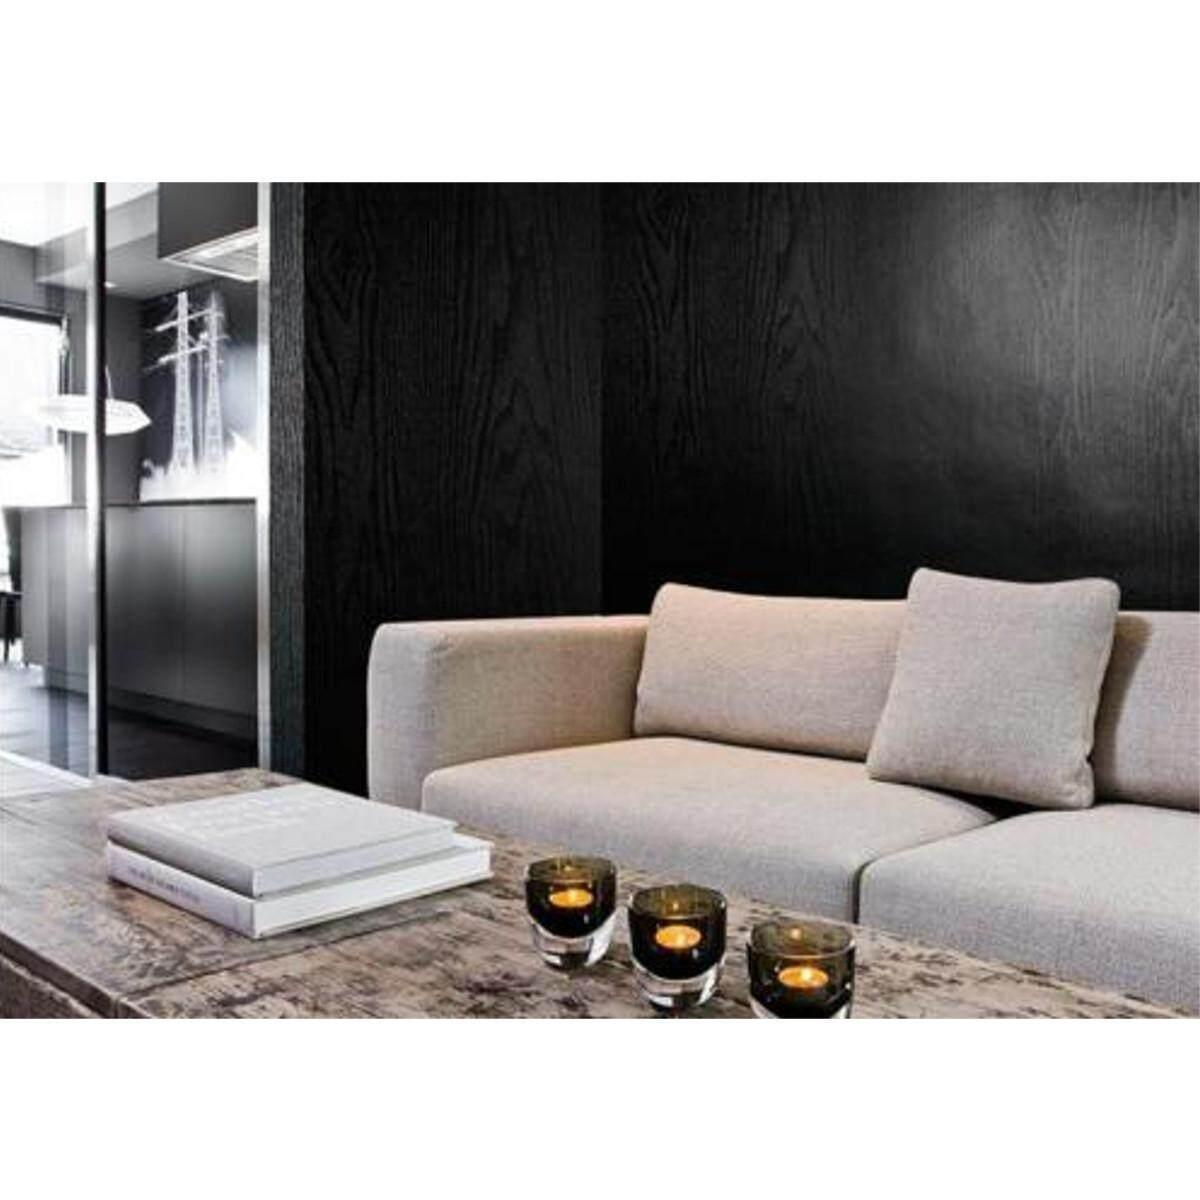 61cm*5m Black Wood Looking Textured Self Adhesive Decor Contact Paper Vinyl Shelf Liner